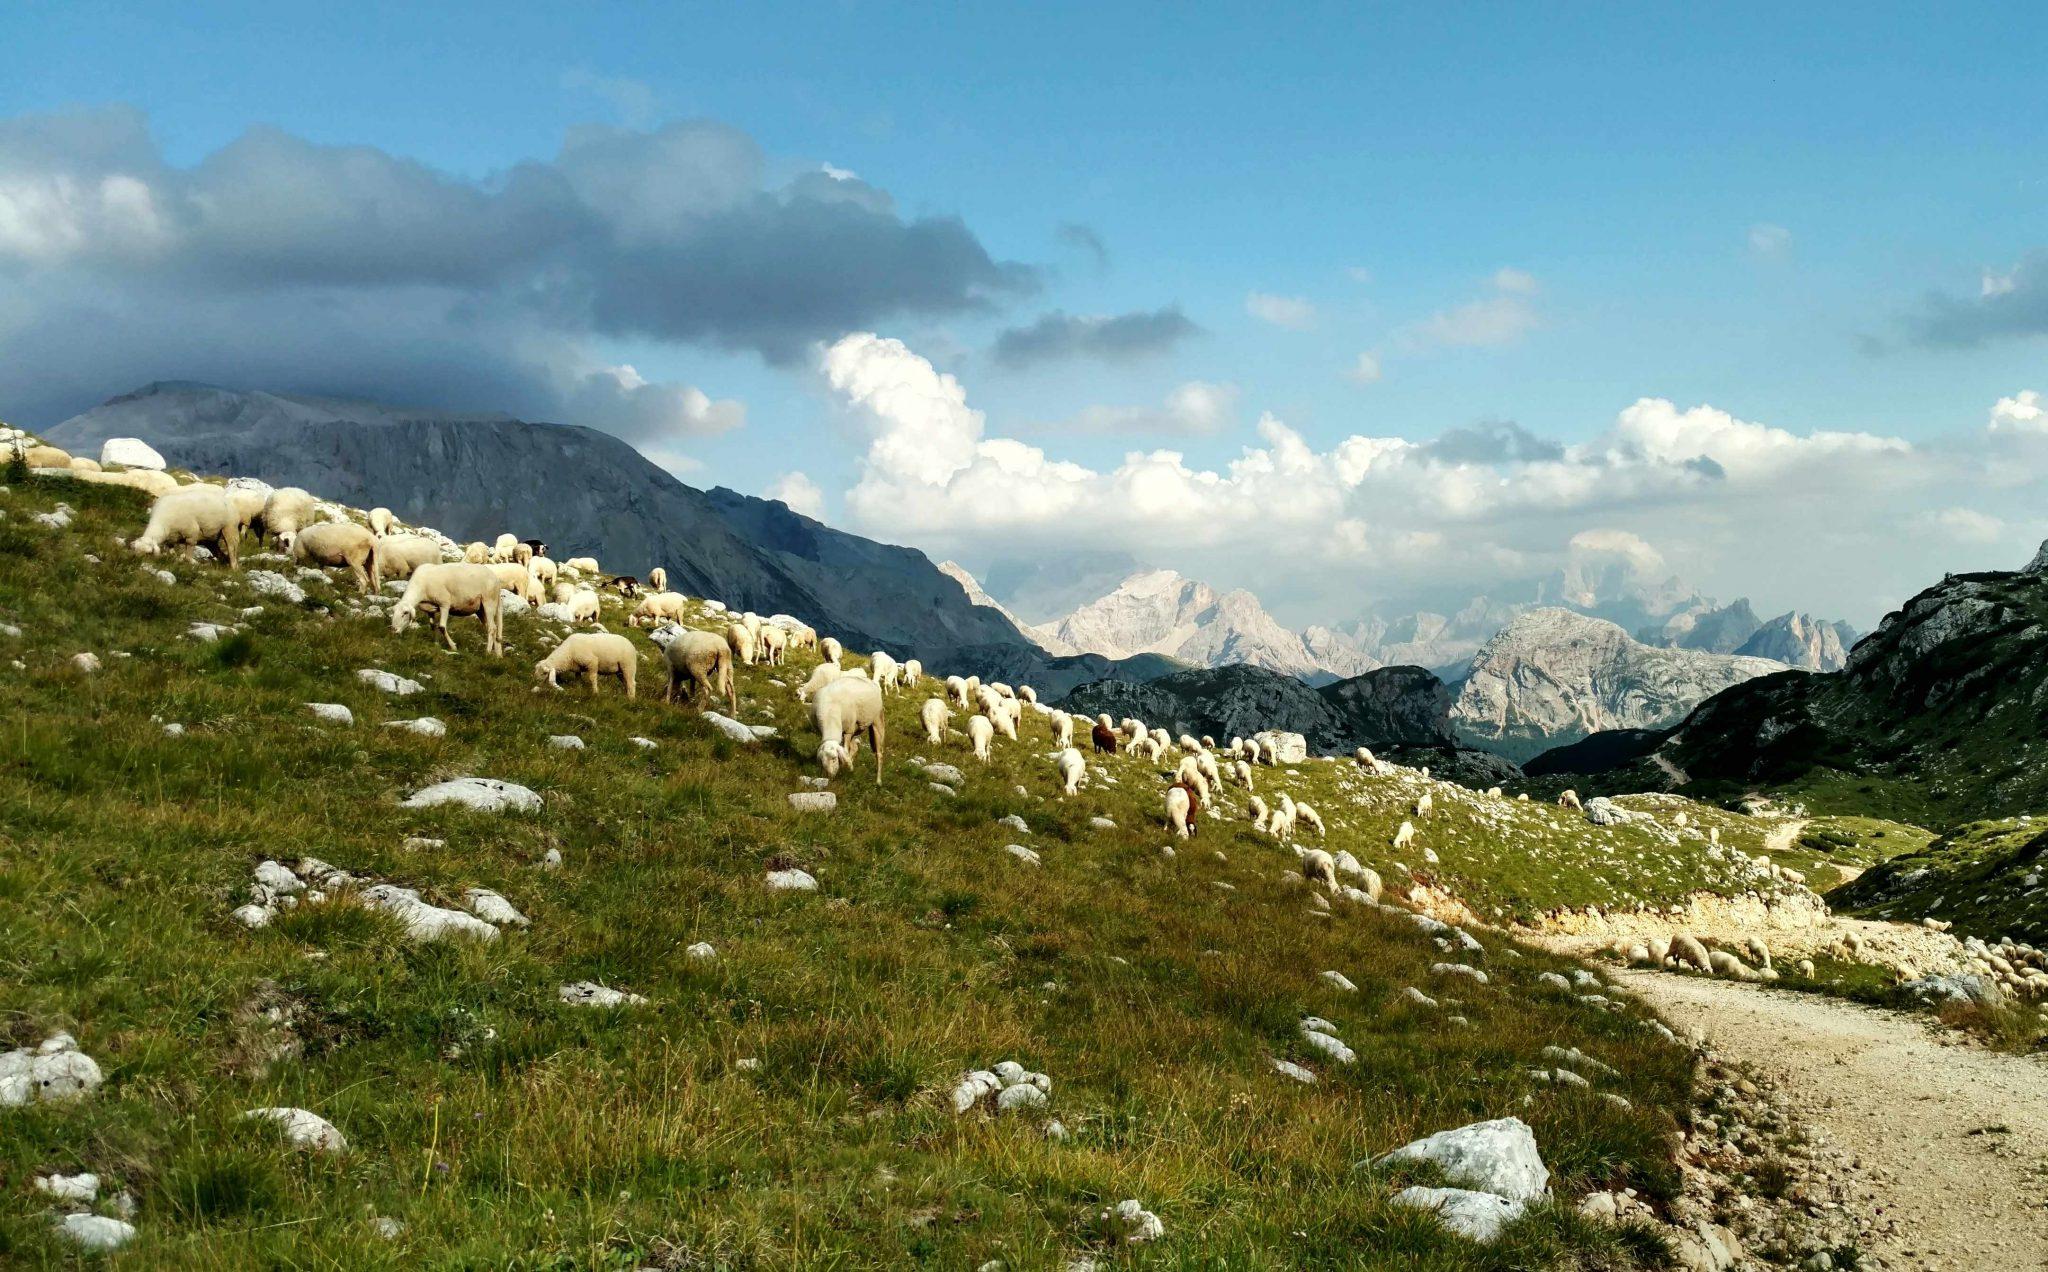 Schapies schapies schapies, Dolomiti Superski!